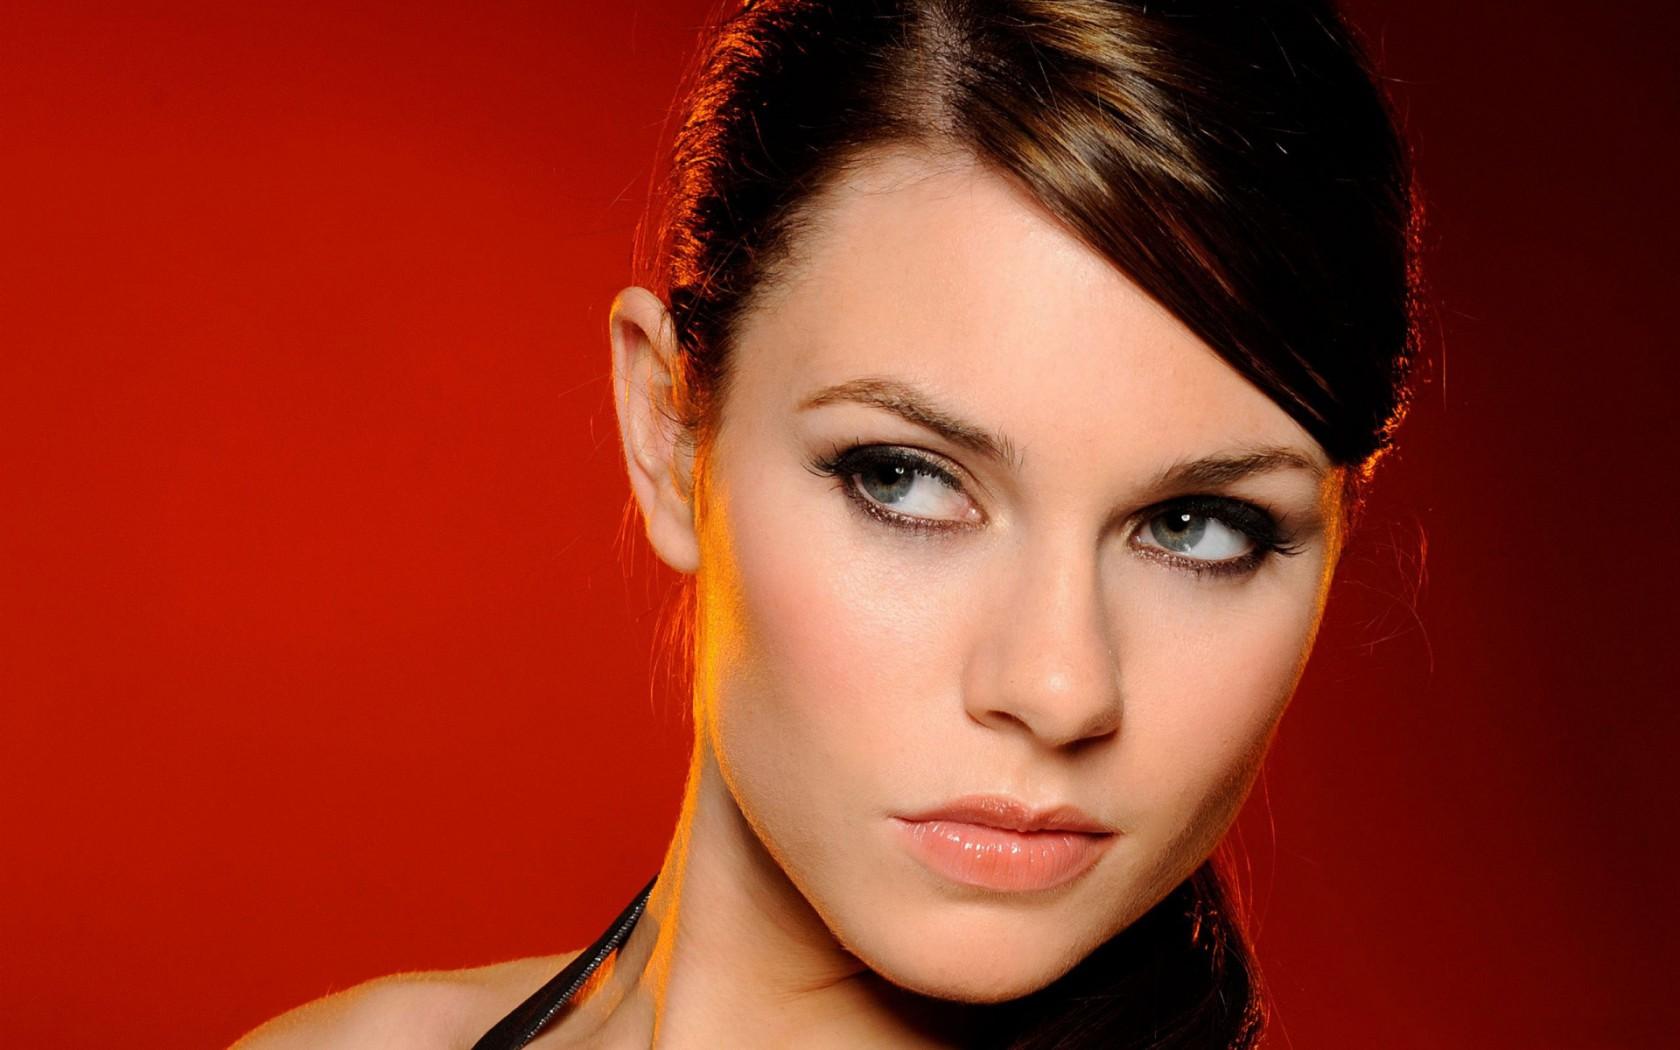 Alison-Carroll-06